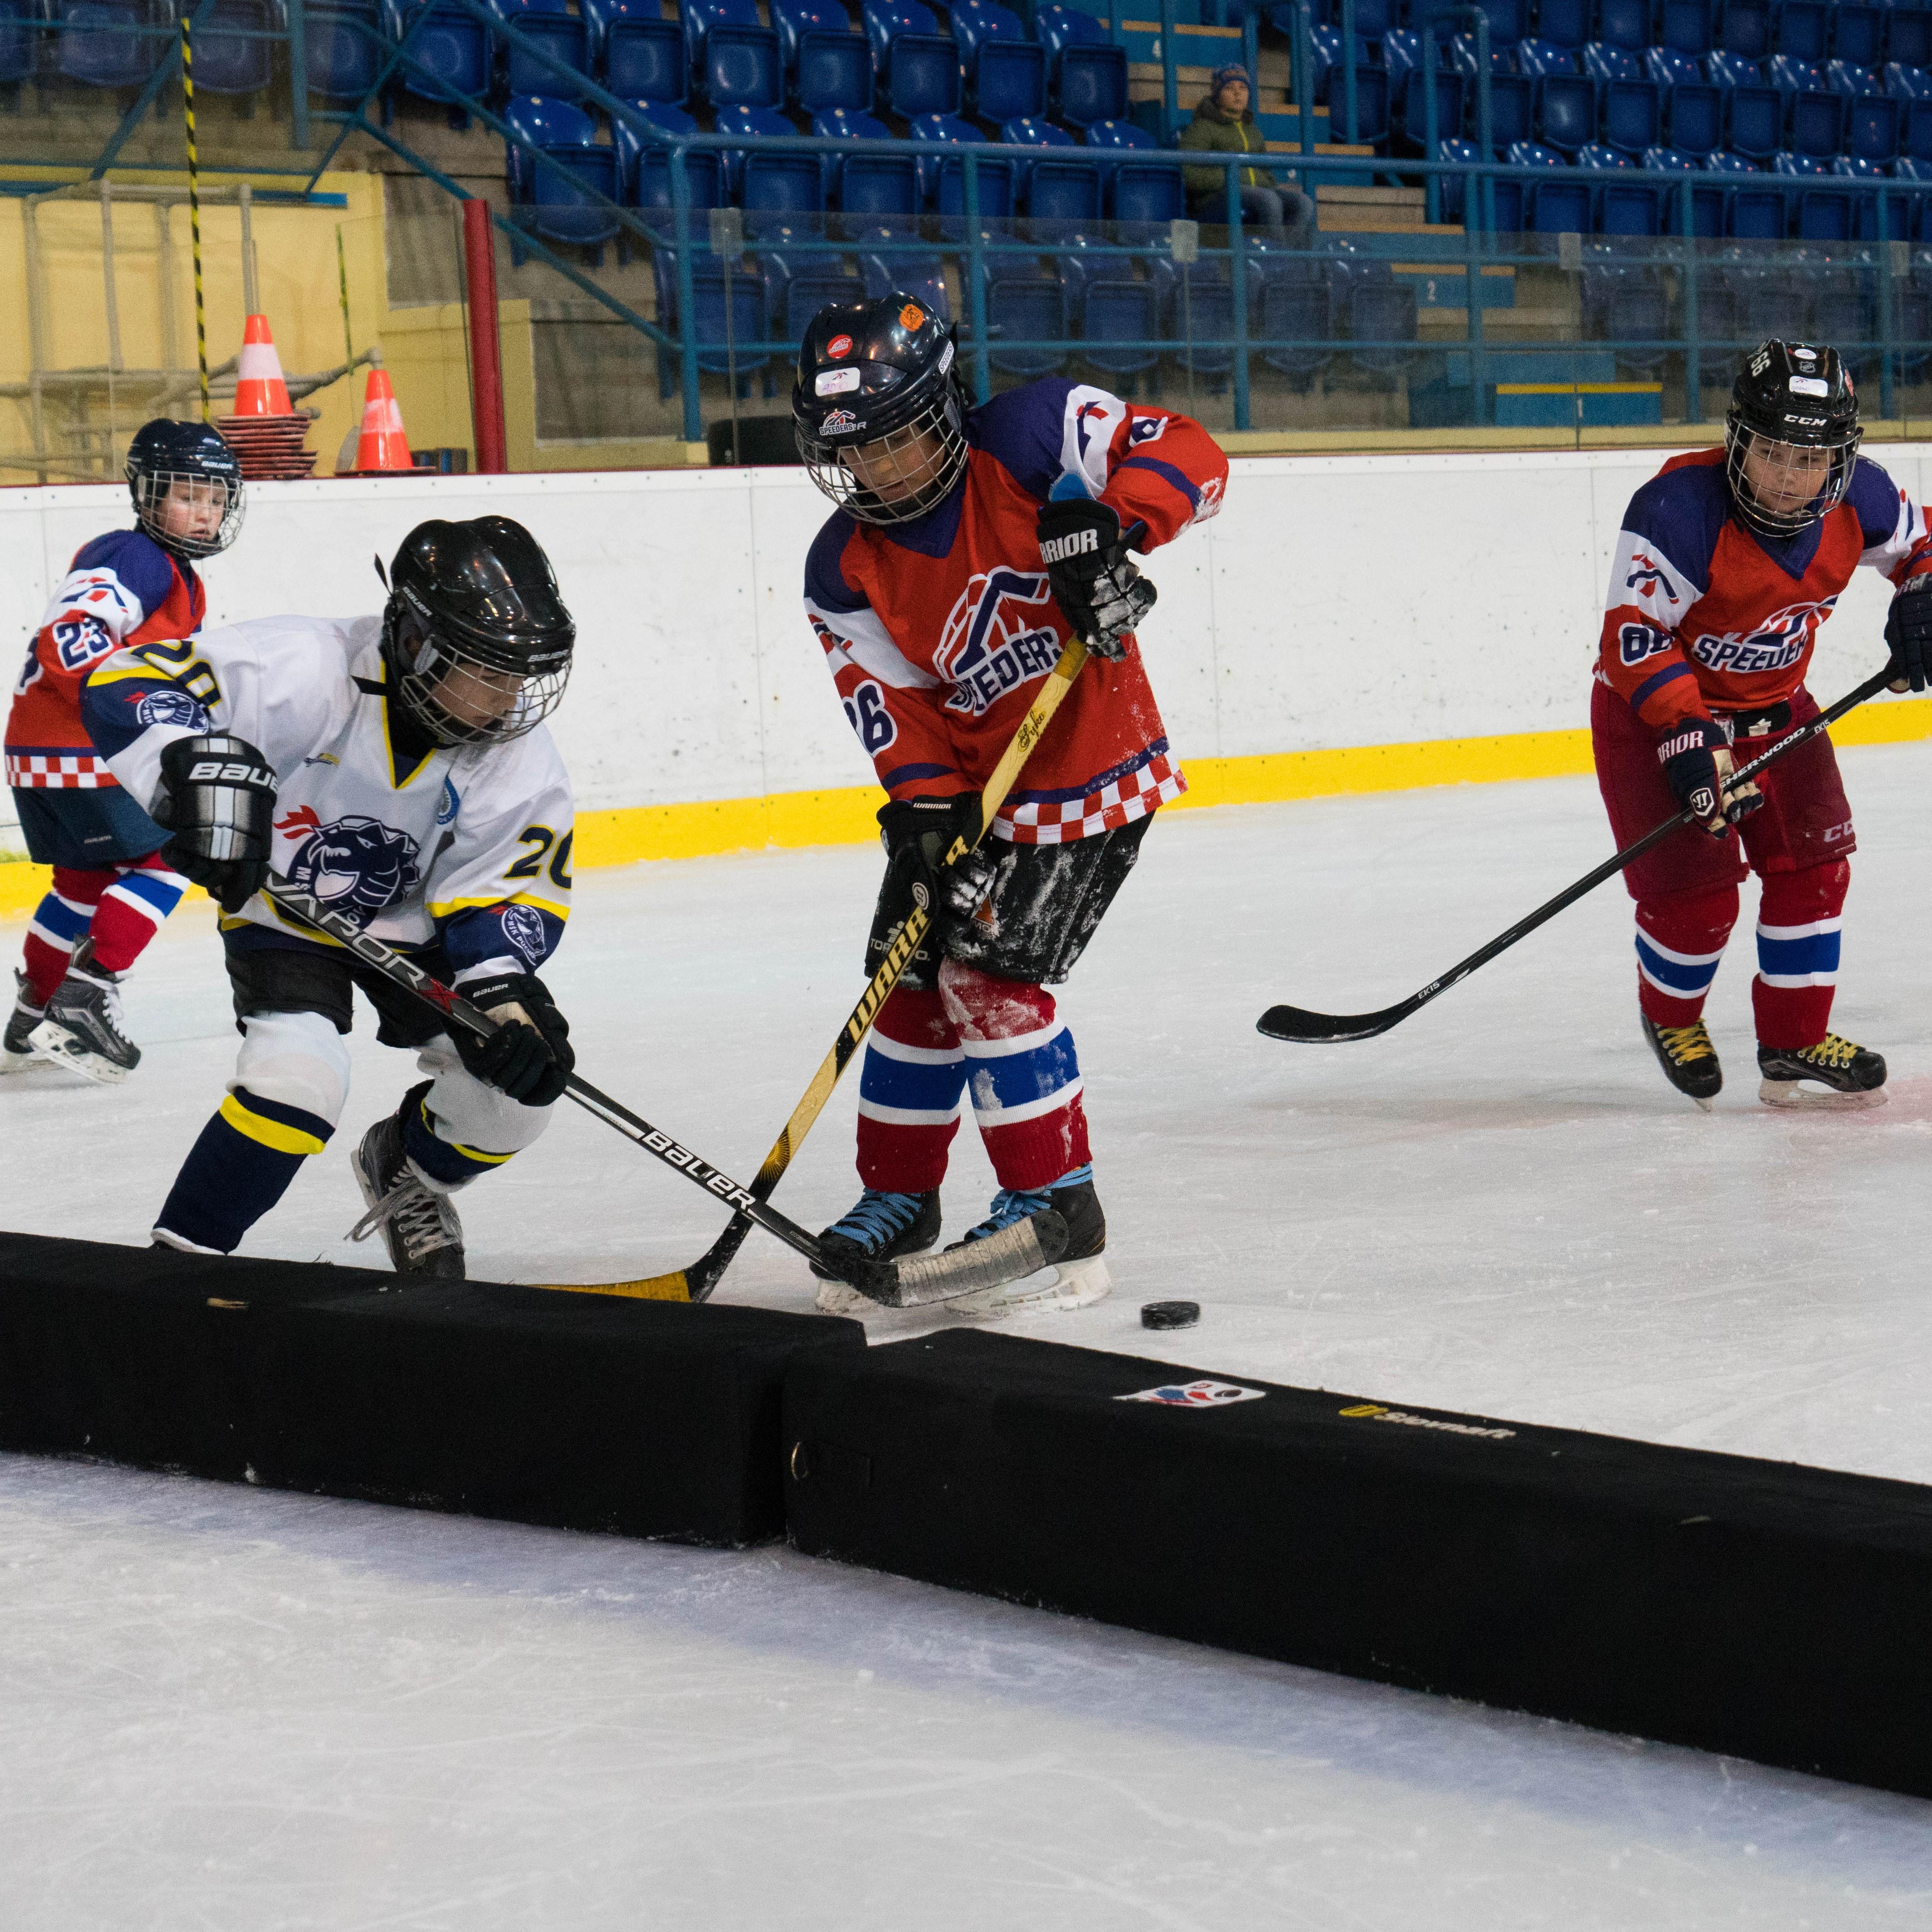 hokejovy turnaj Puchov 2.miesto speeders bratislava 12